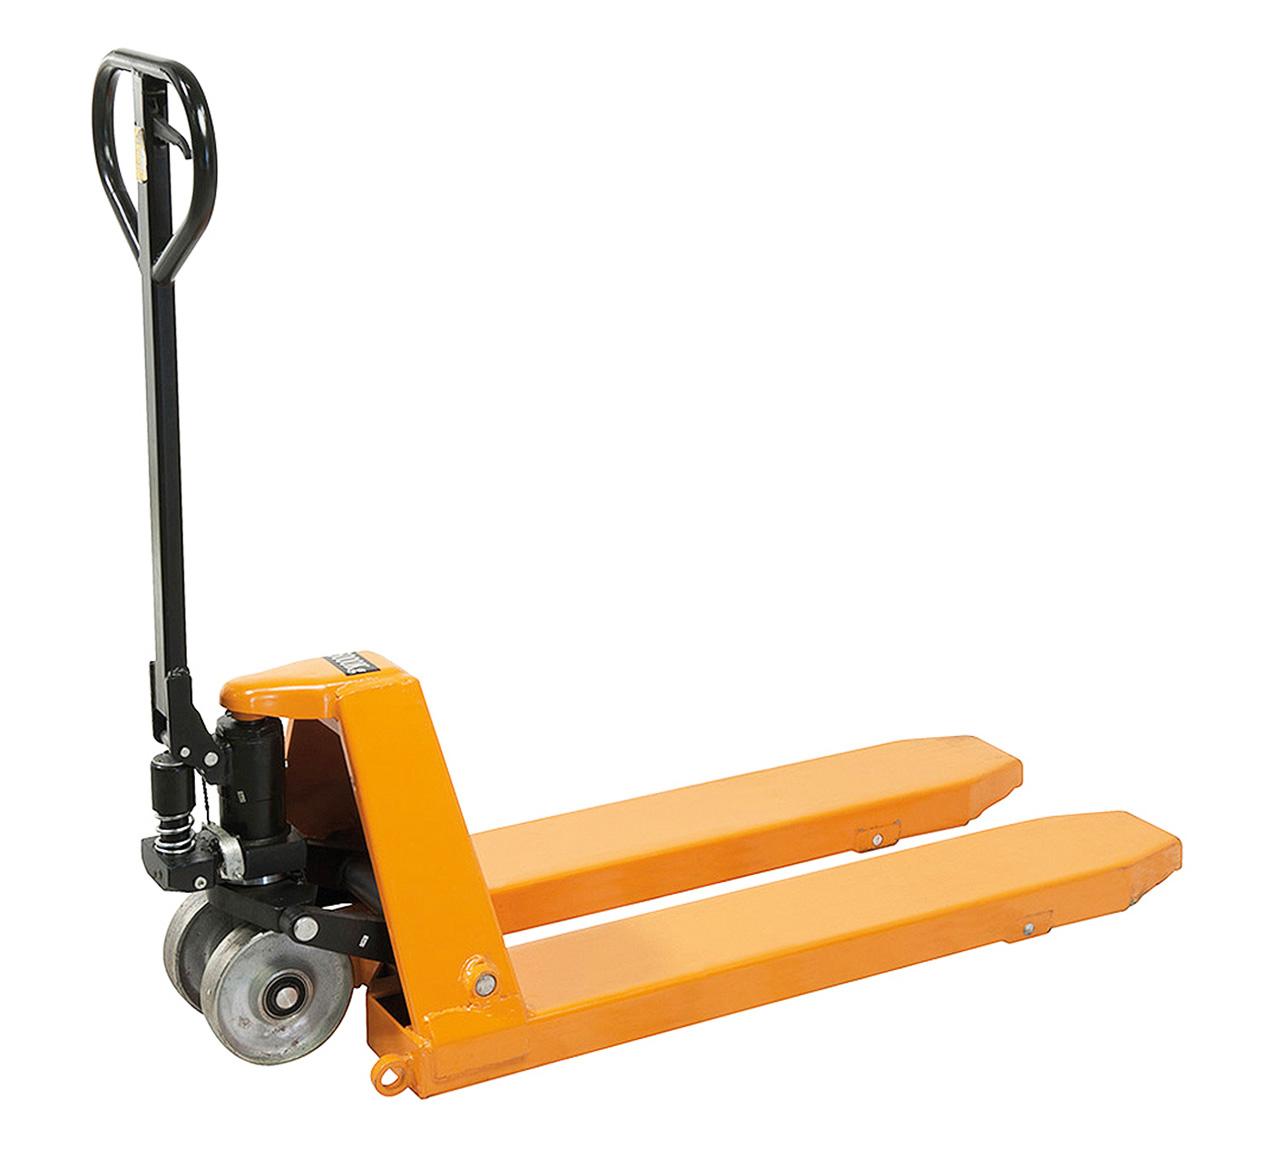 Wózek paletowy PHW 5,0 S * BERNARDO